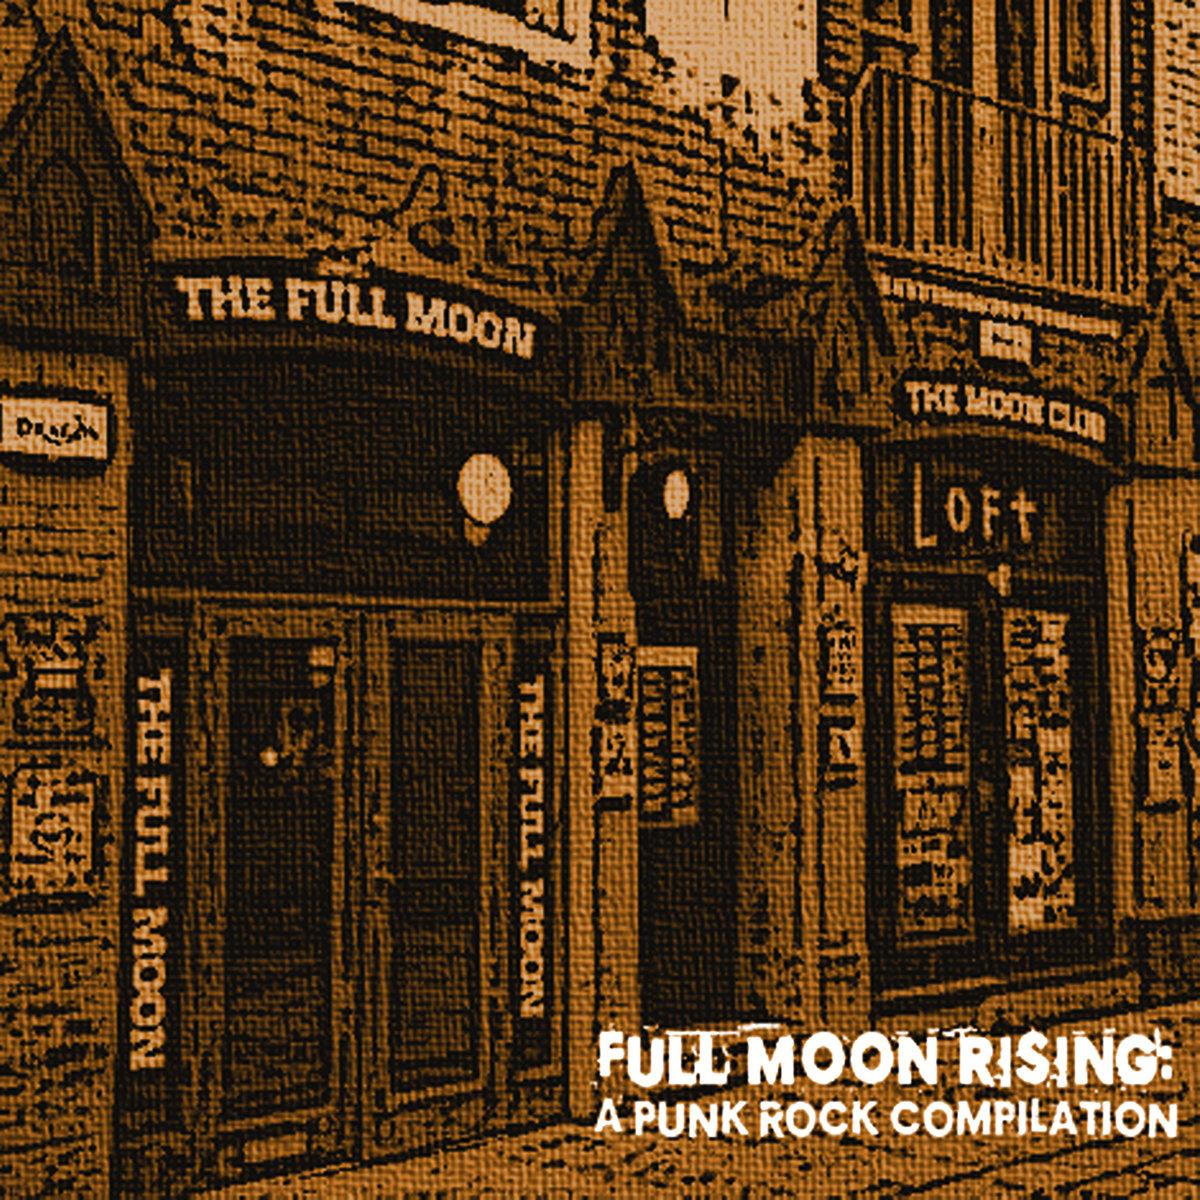 Full Moon Rising - Team Beard Compilation